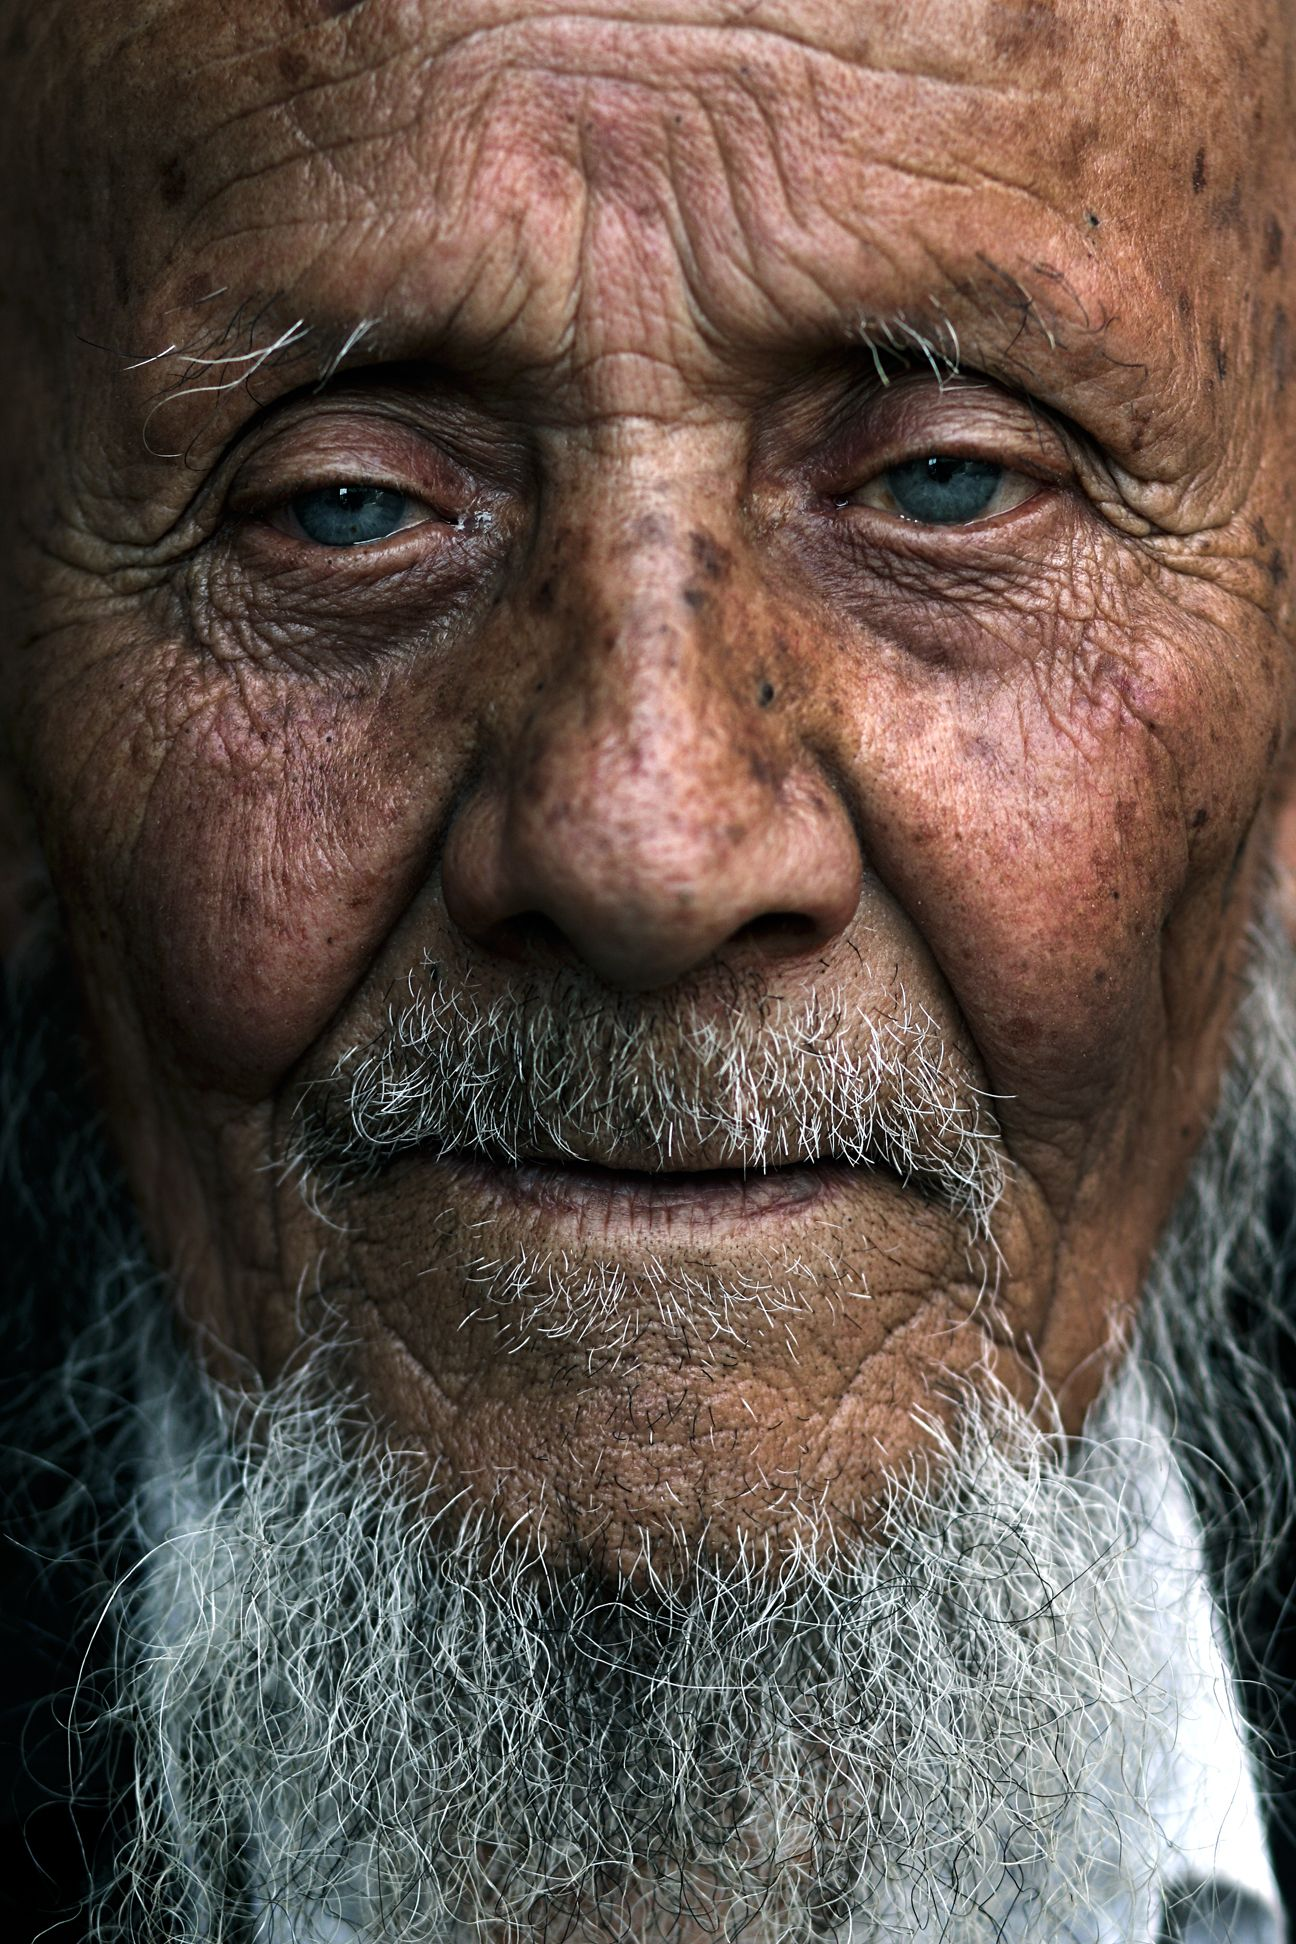 How to get an older man